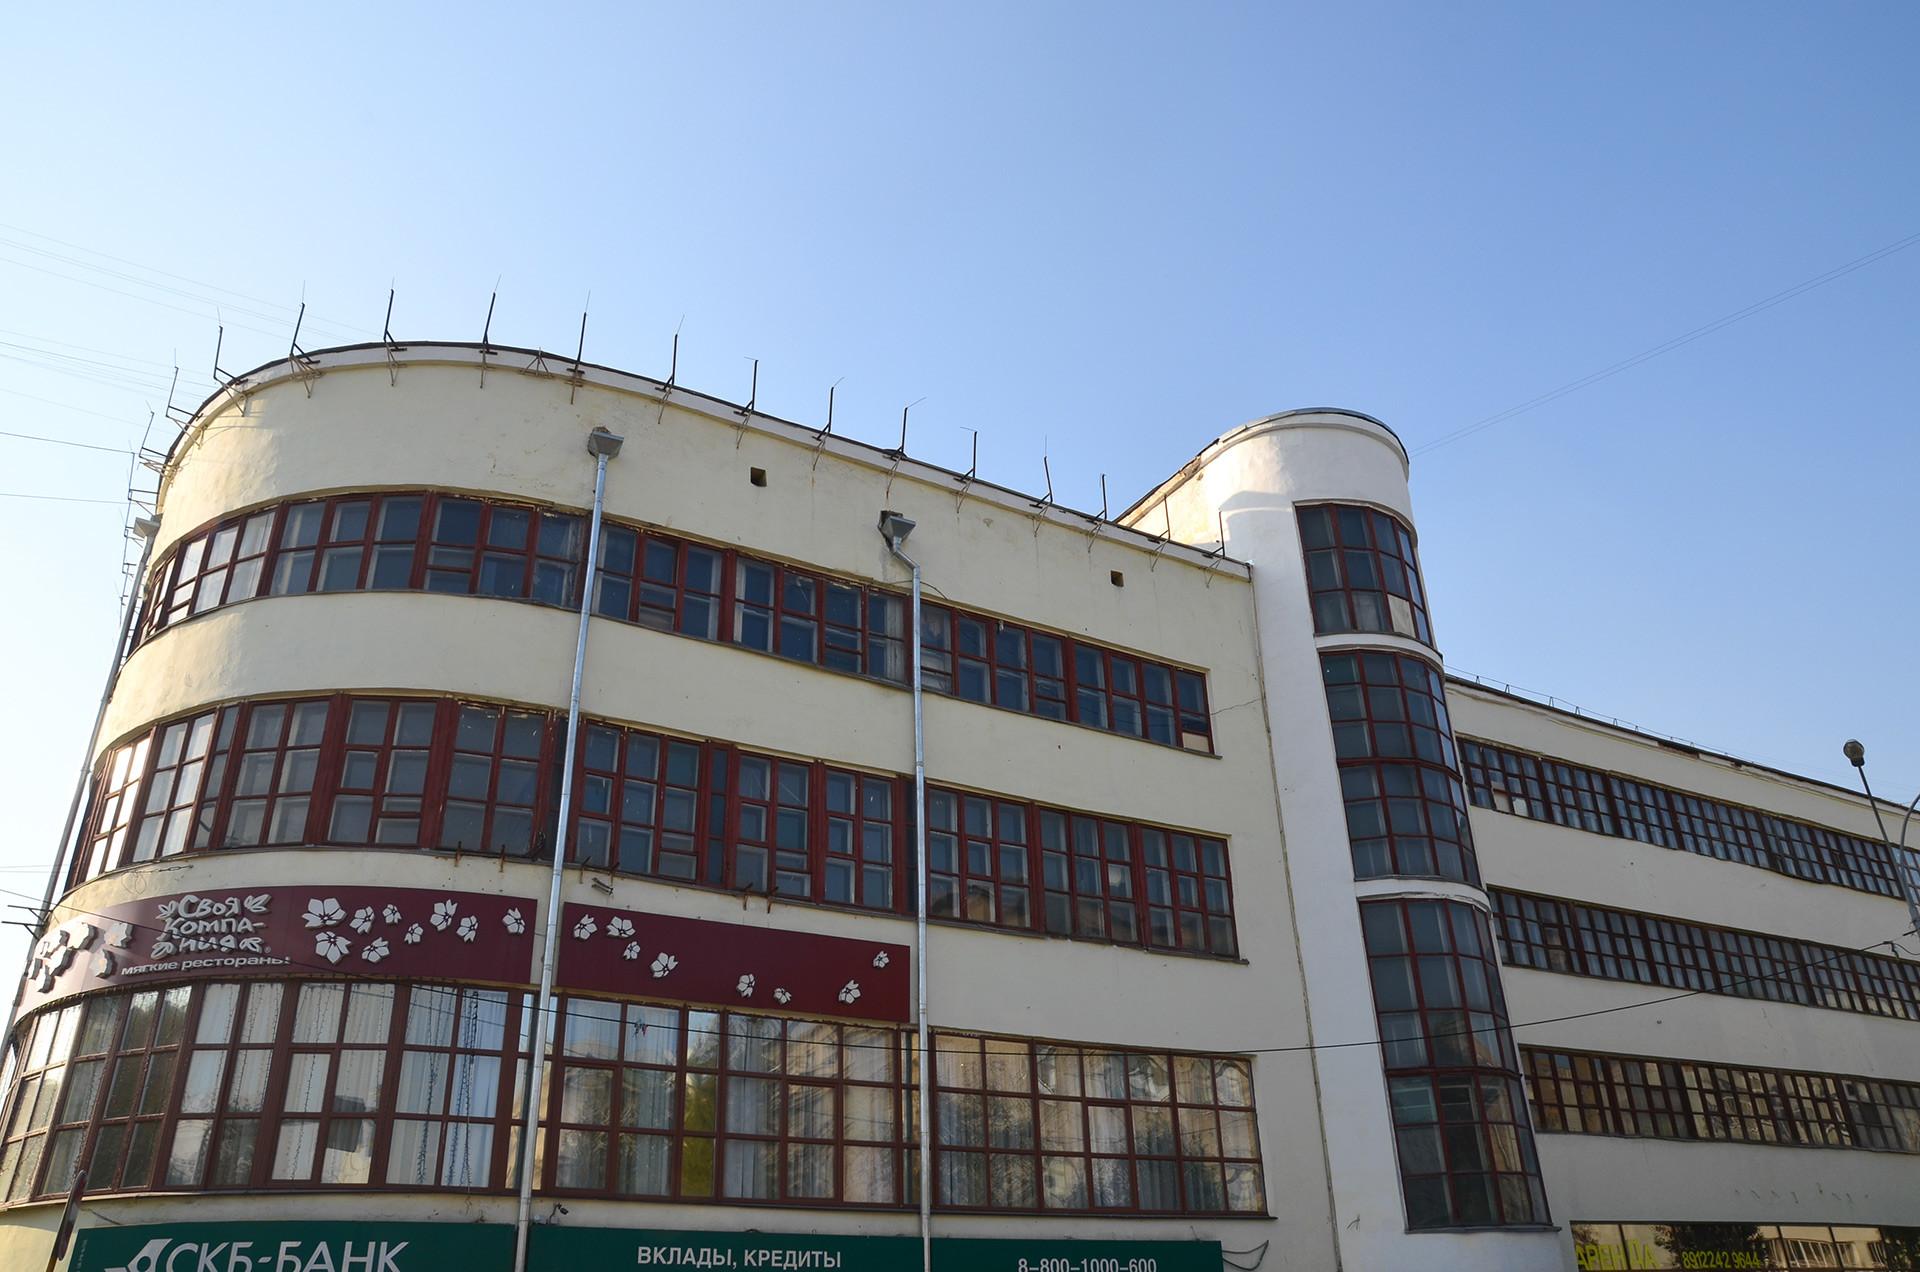 Press House